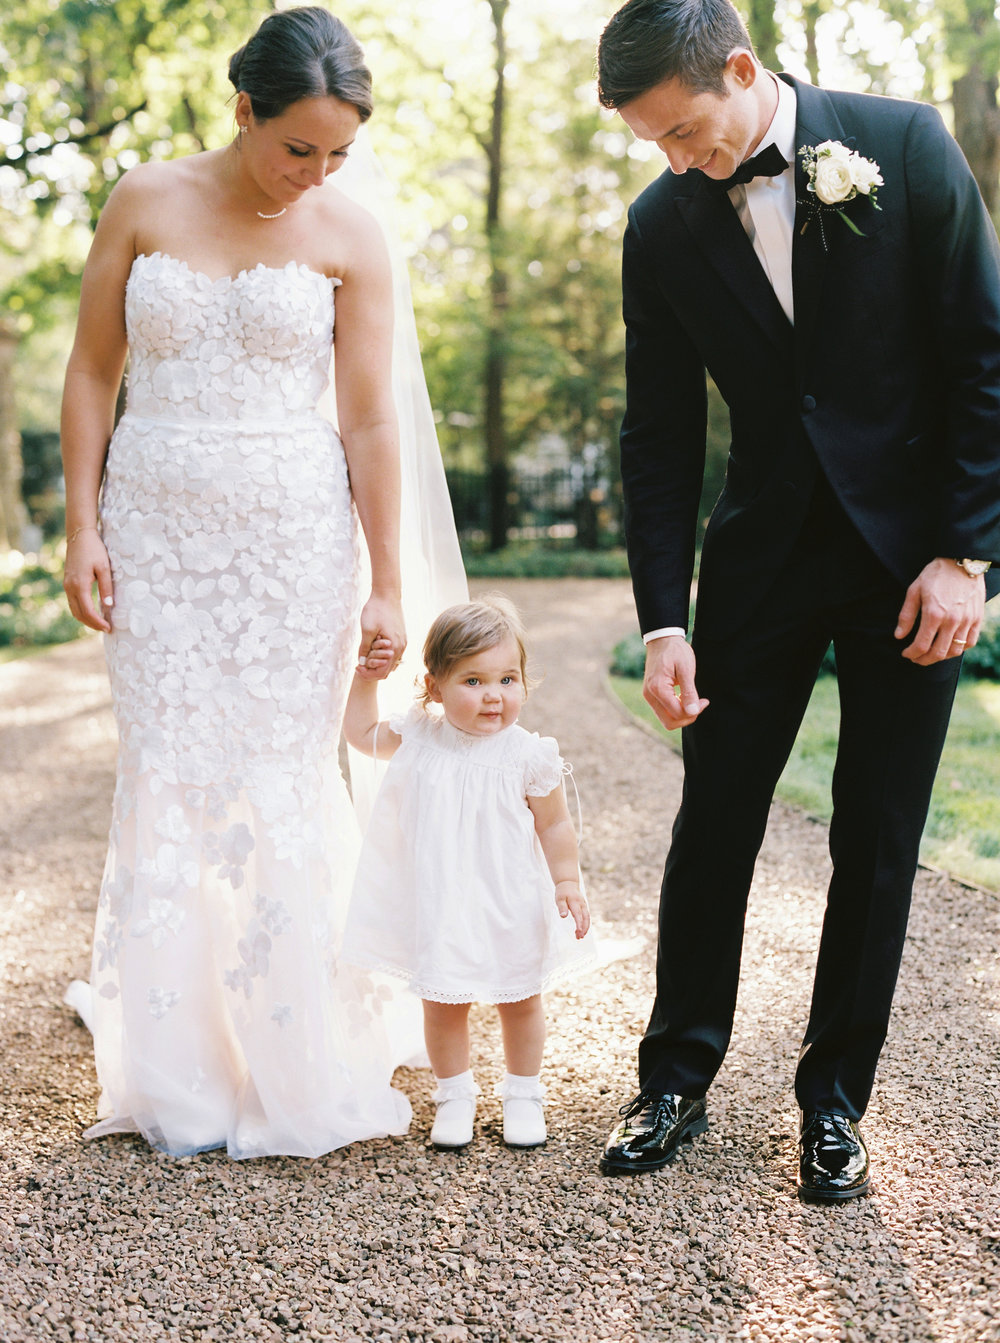 Kyle John l Fine Art Wedding Photography l Chicago, Copenhagen, California, New York, Destination l Blog l Kate and Michael_Winnetka_24